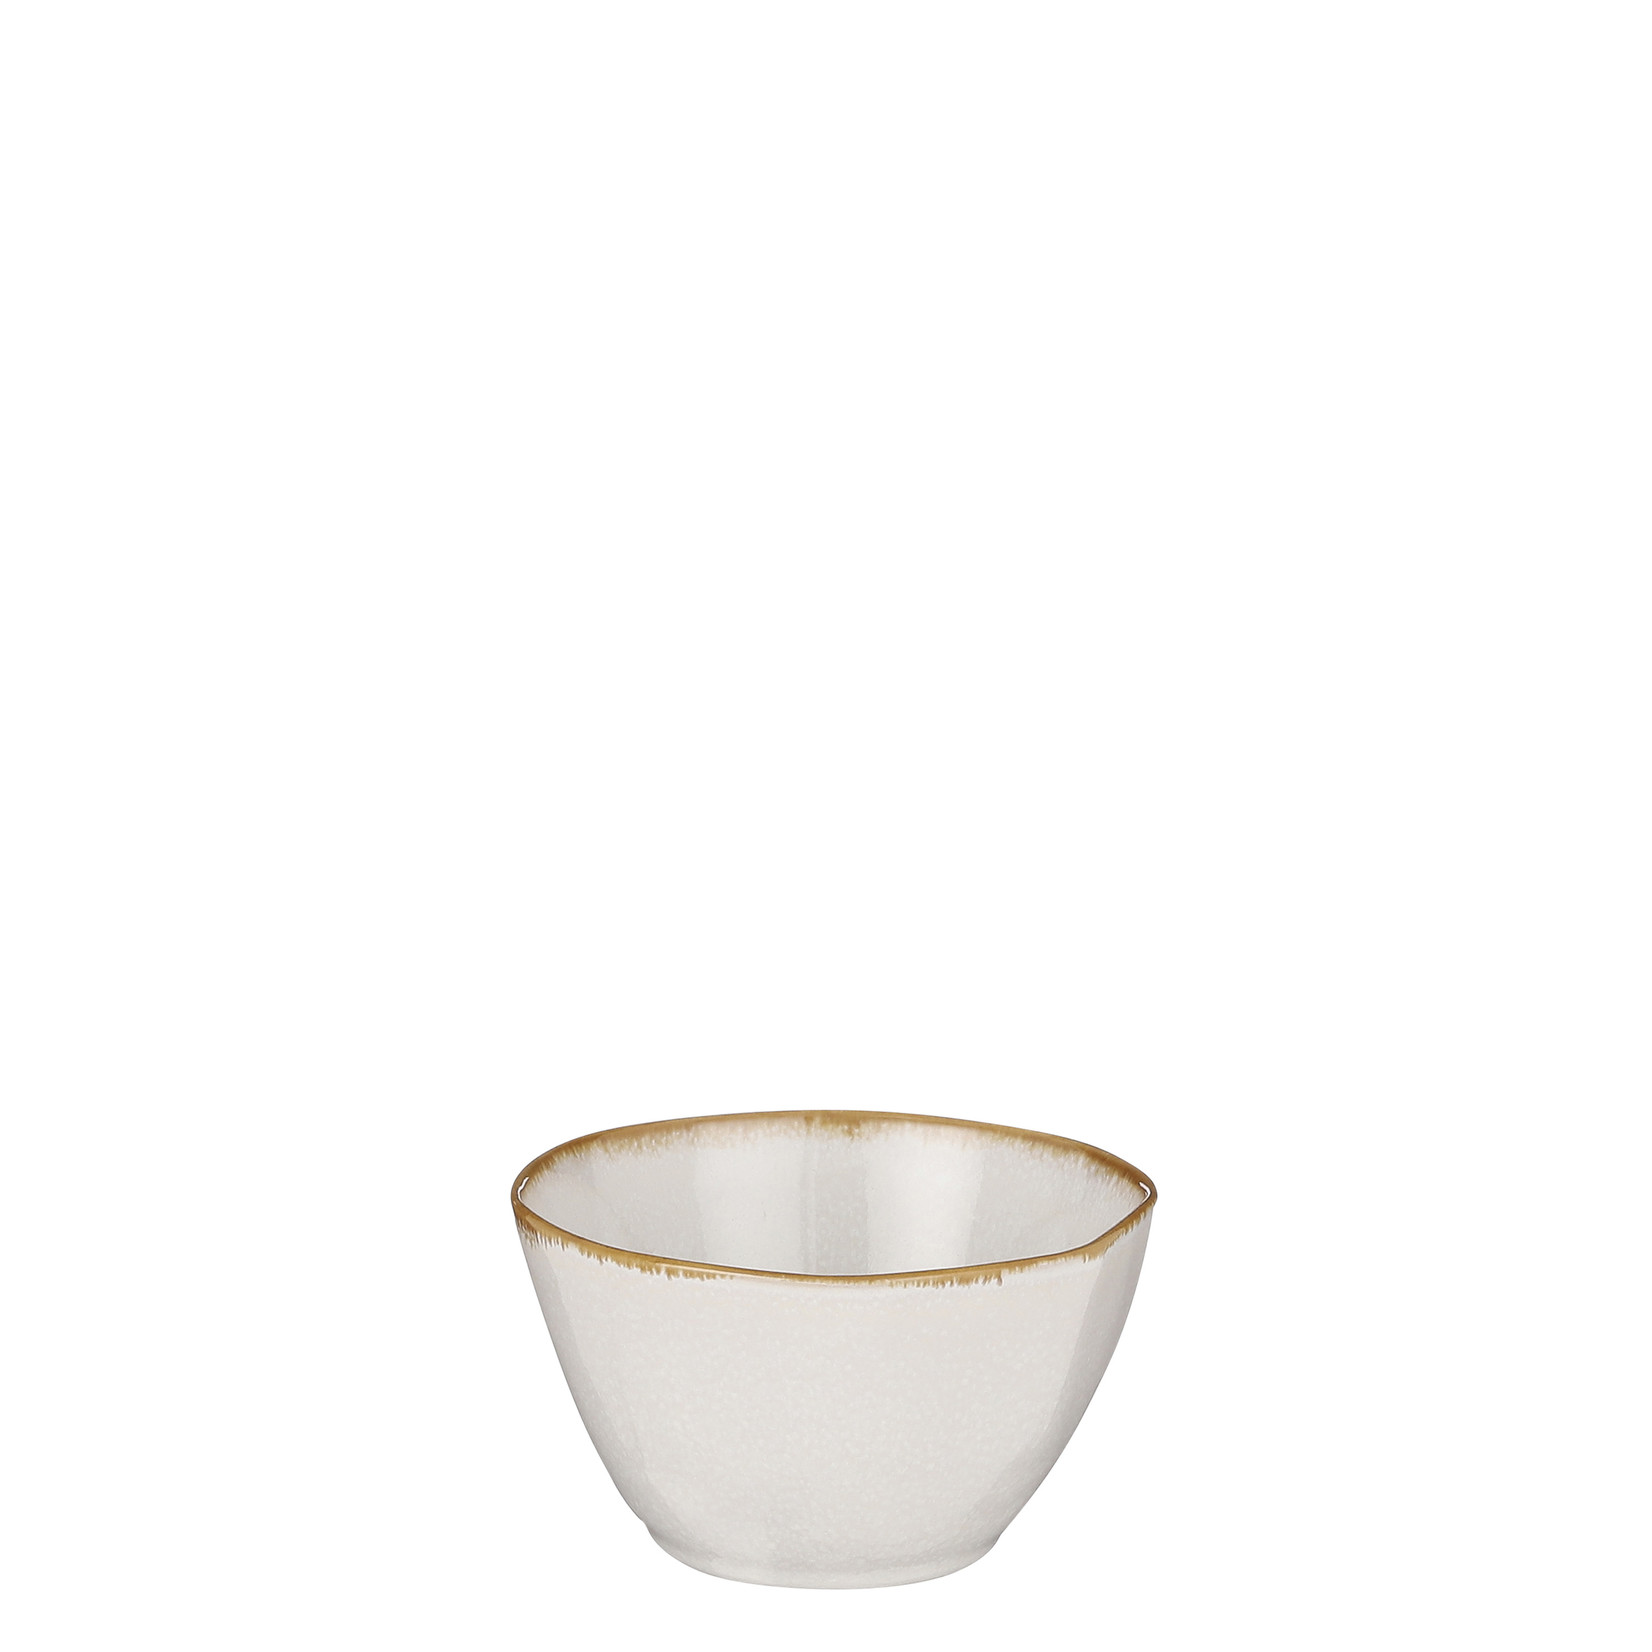 MiCa Tabo bowl white